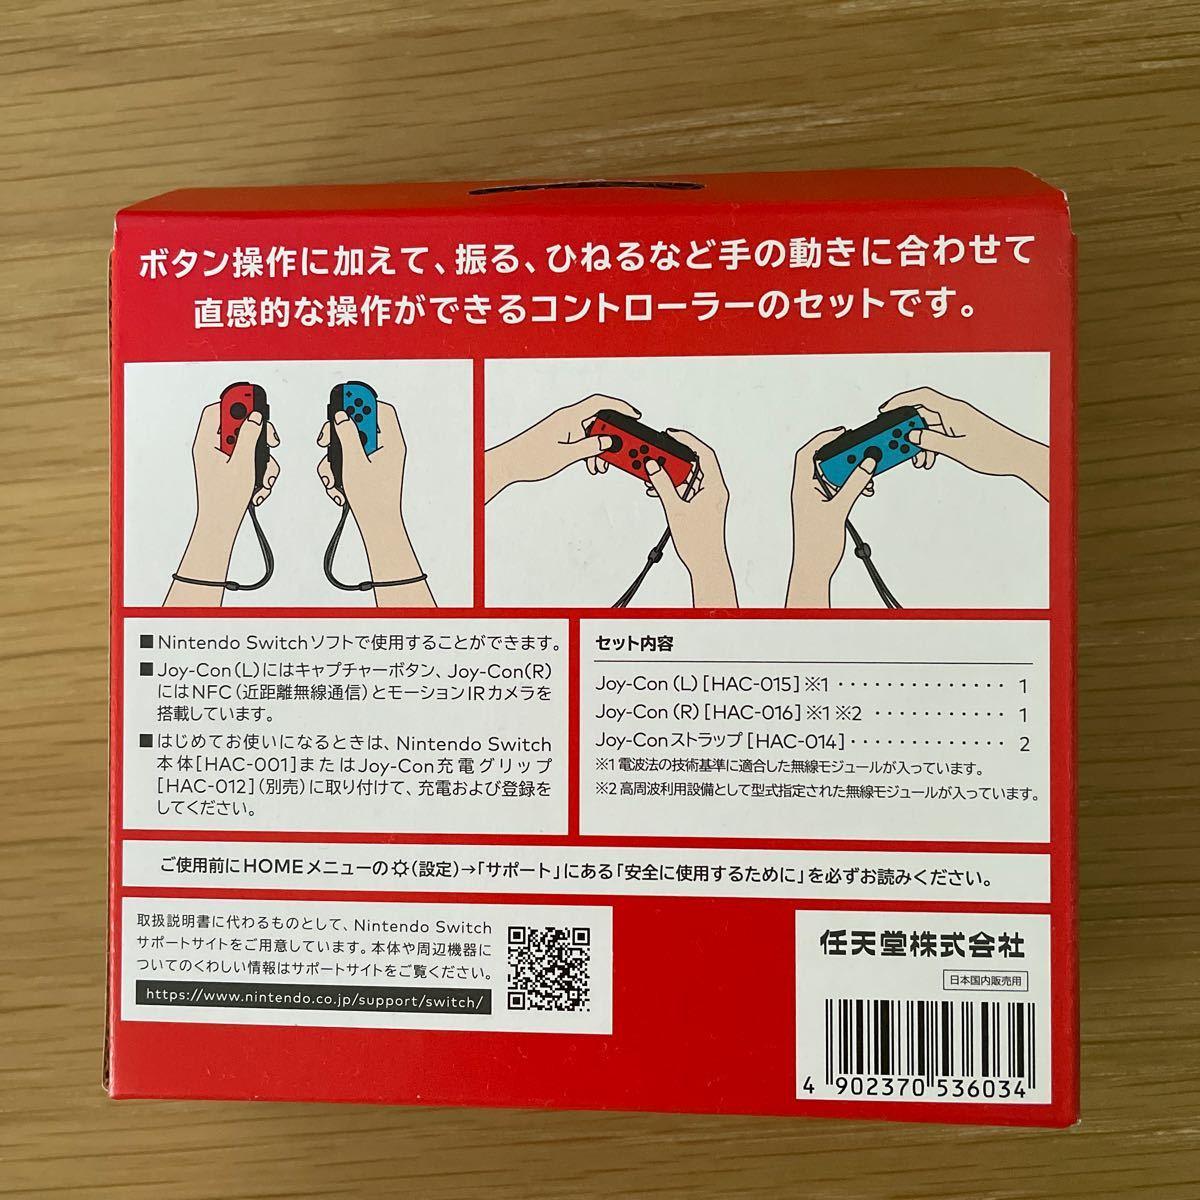 Nintendo Switch Joy-Con (L) ネオンレッド (R)ネオンブルー  ジョイコン 任天堂